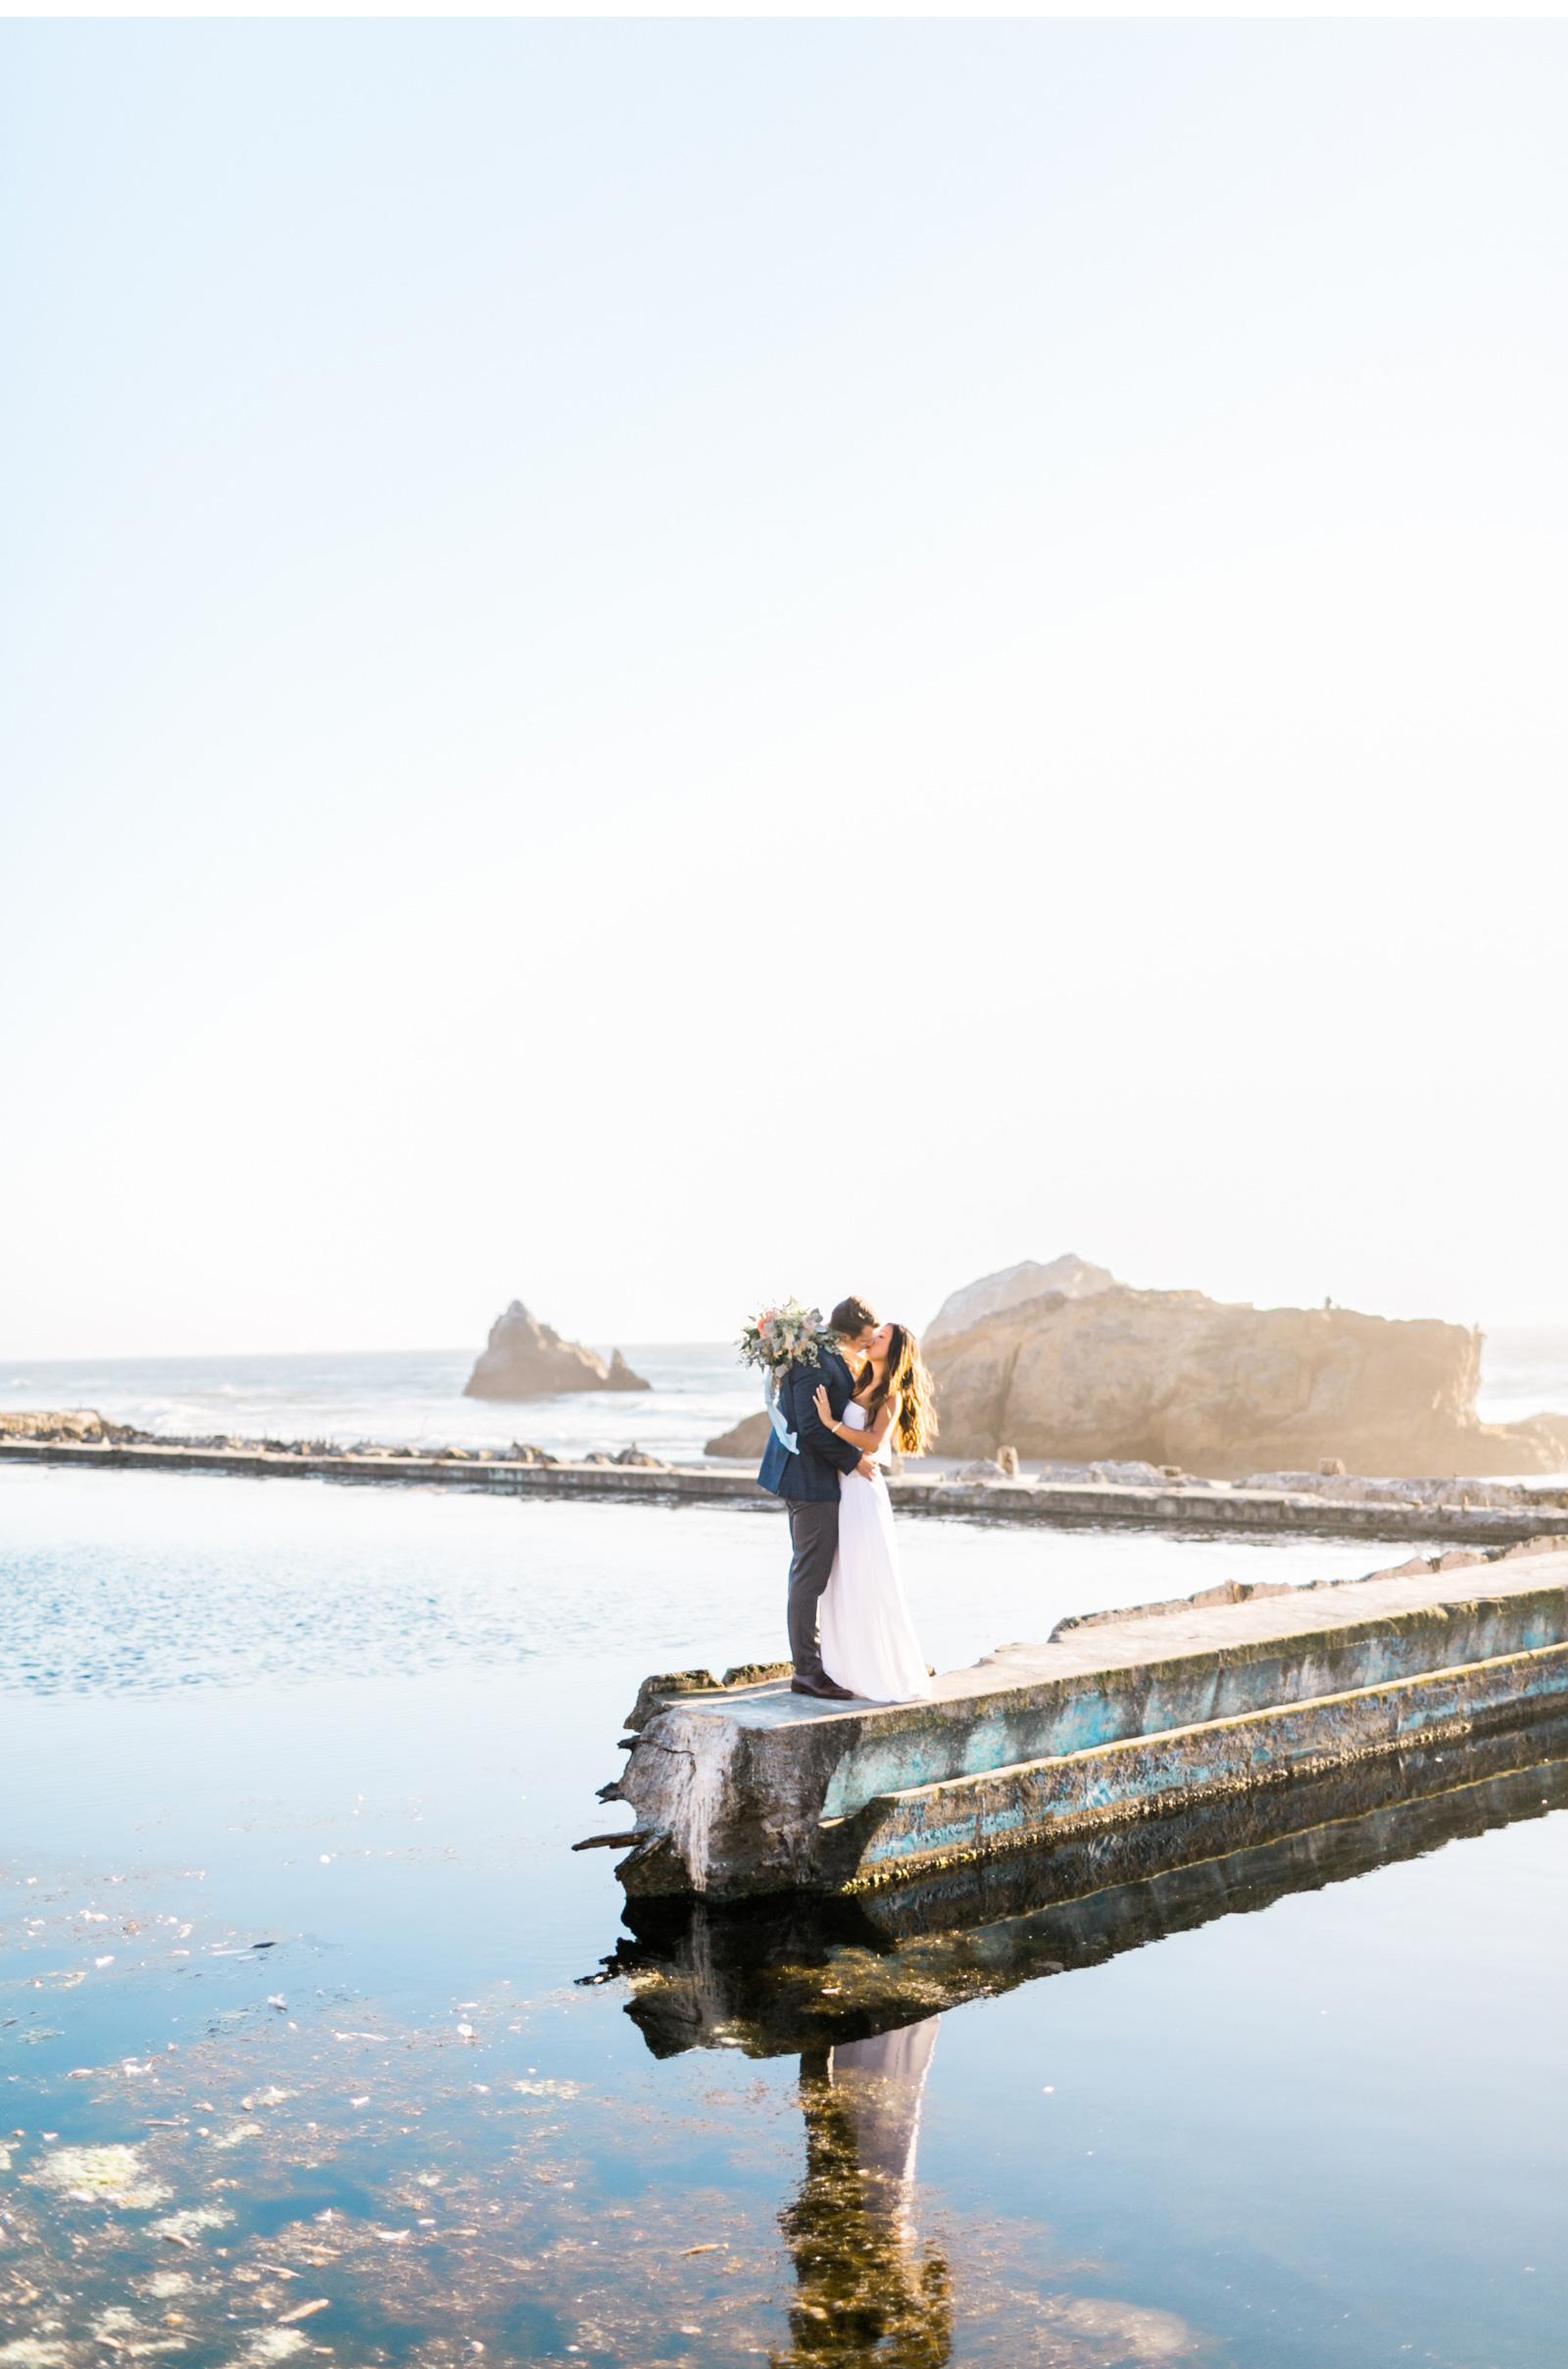 Sutro-Baths-Engagement-Natalie-Schutt-Photography-Style-Me-Pretty_04.jpg